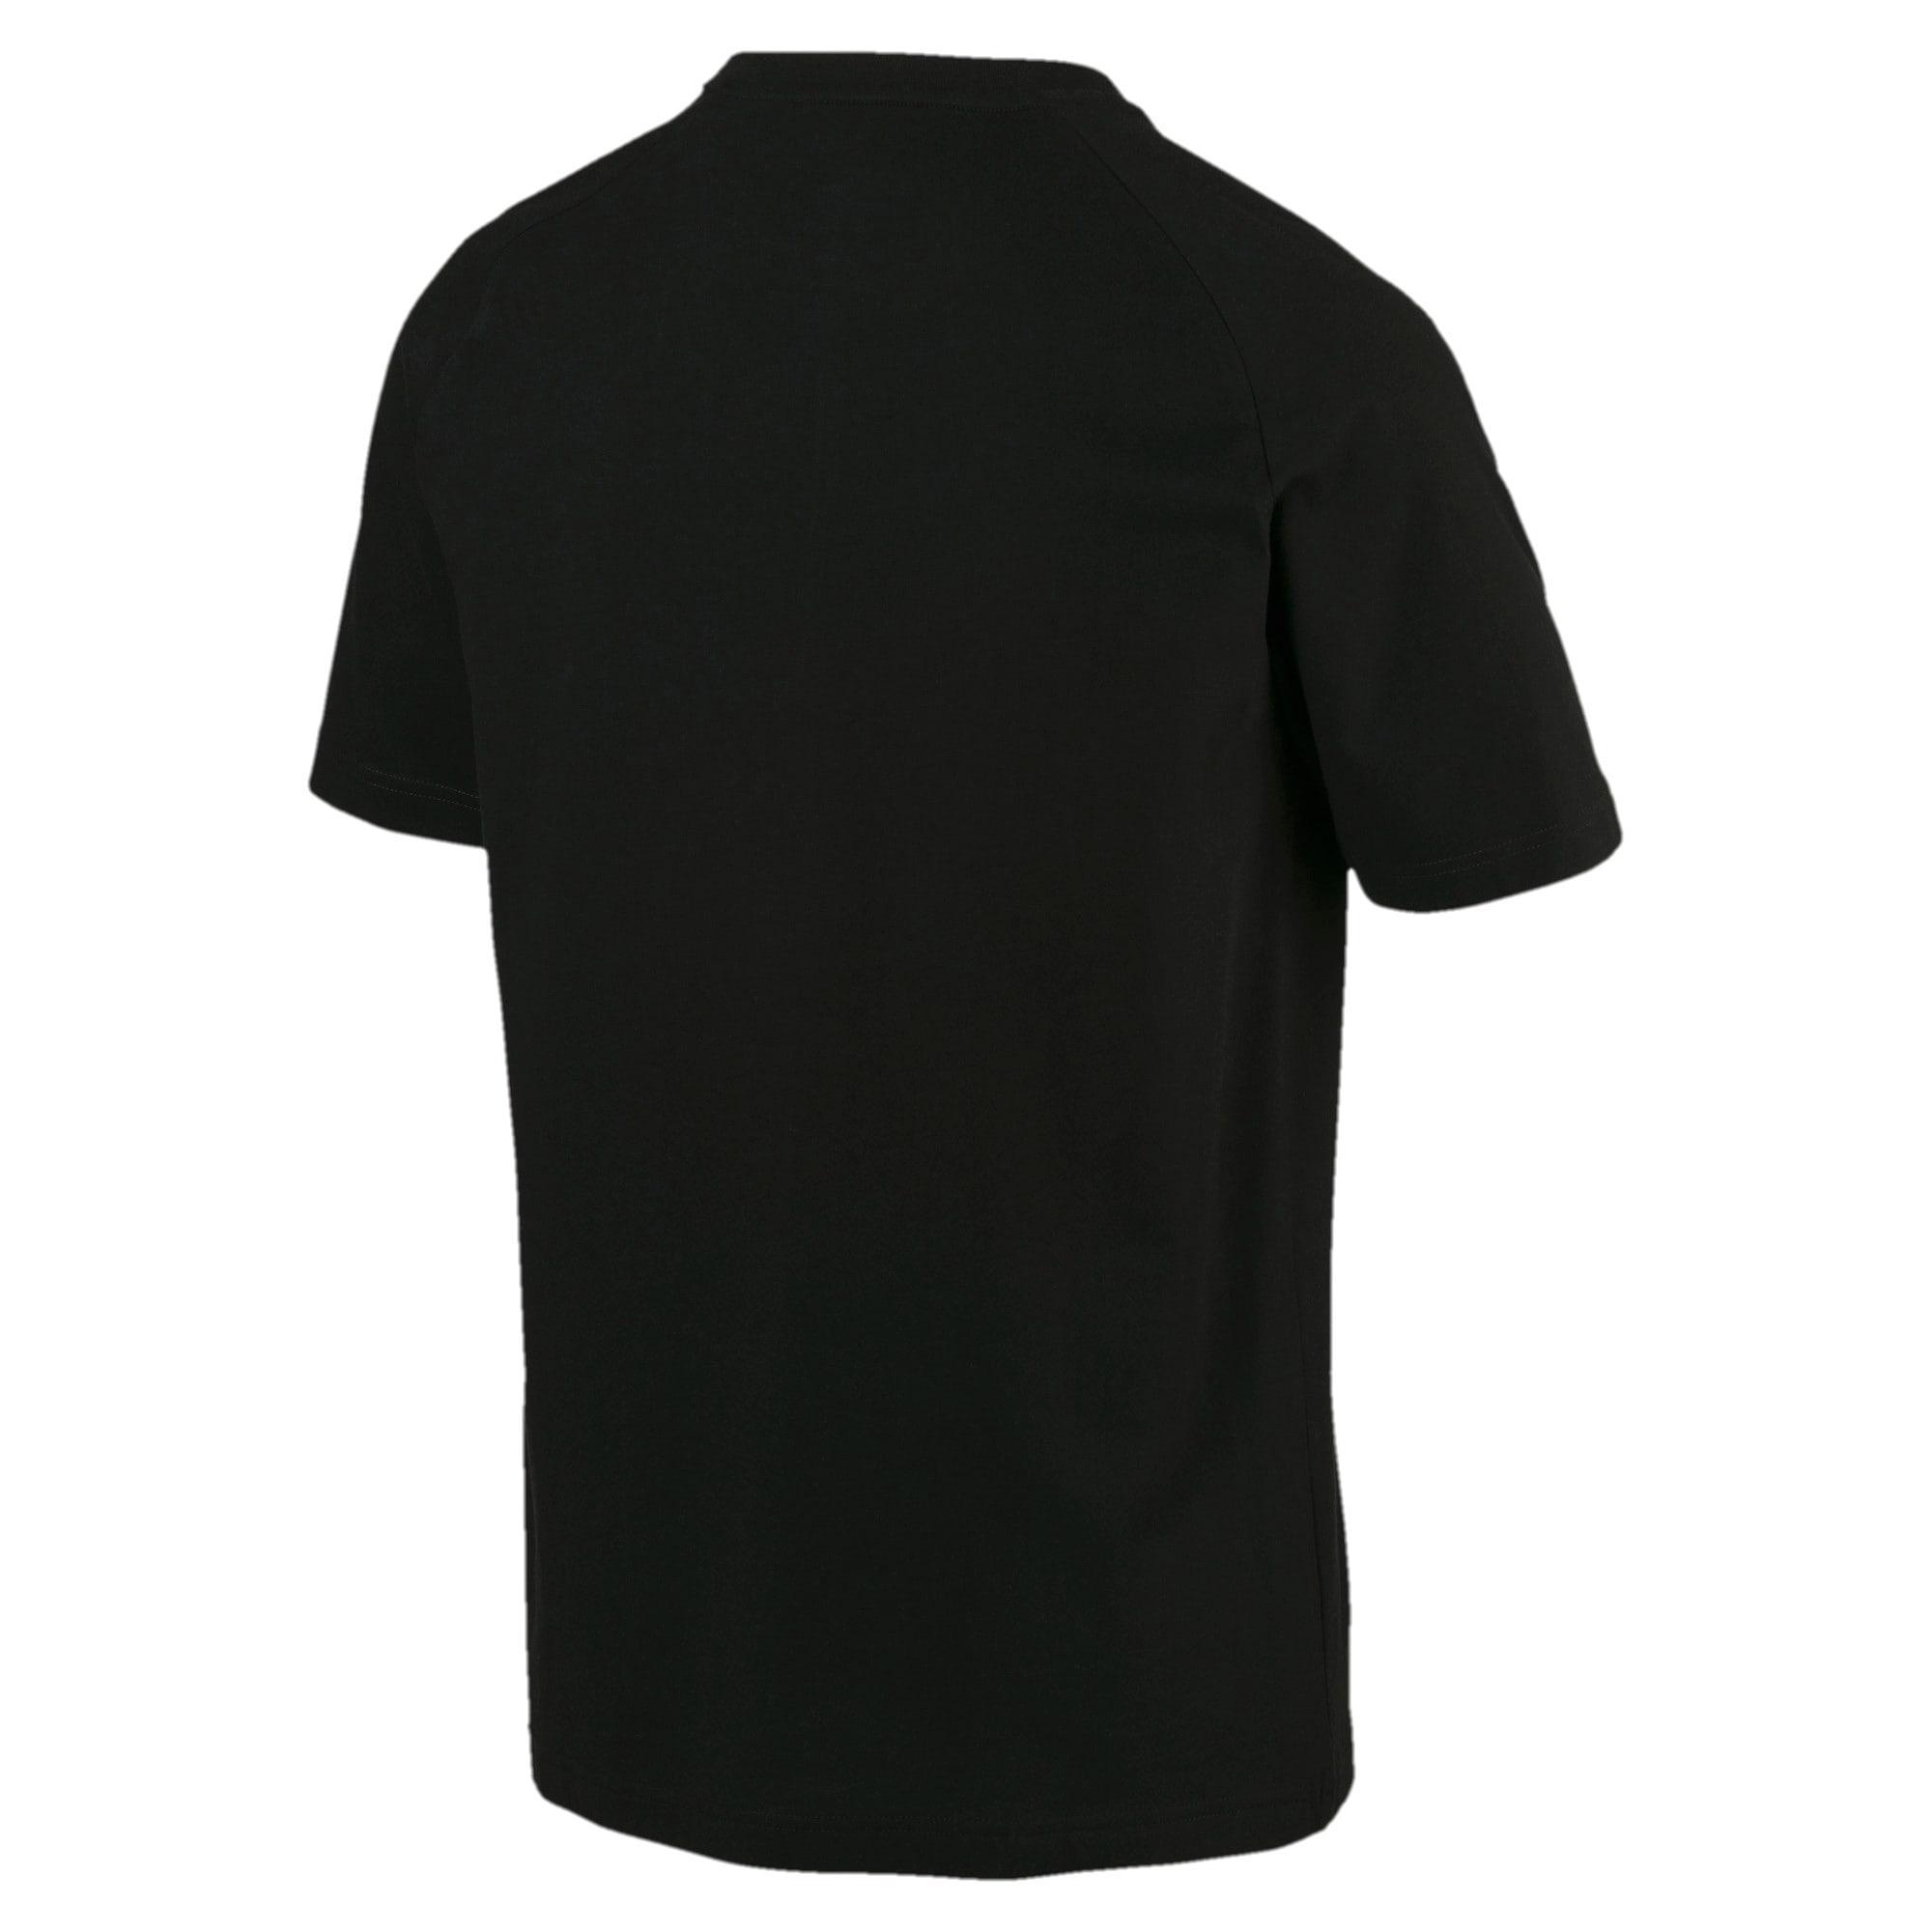 Thumbnail 3 of Modern Sports Men's Tee, Cotton Black, medium